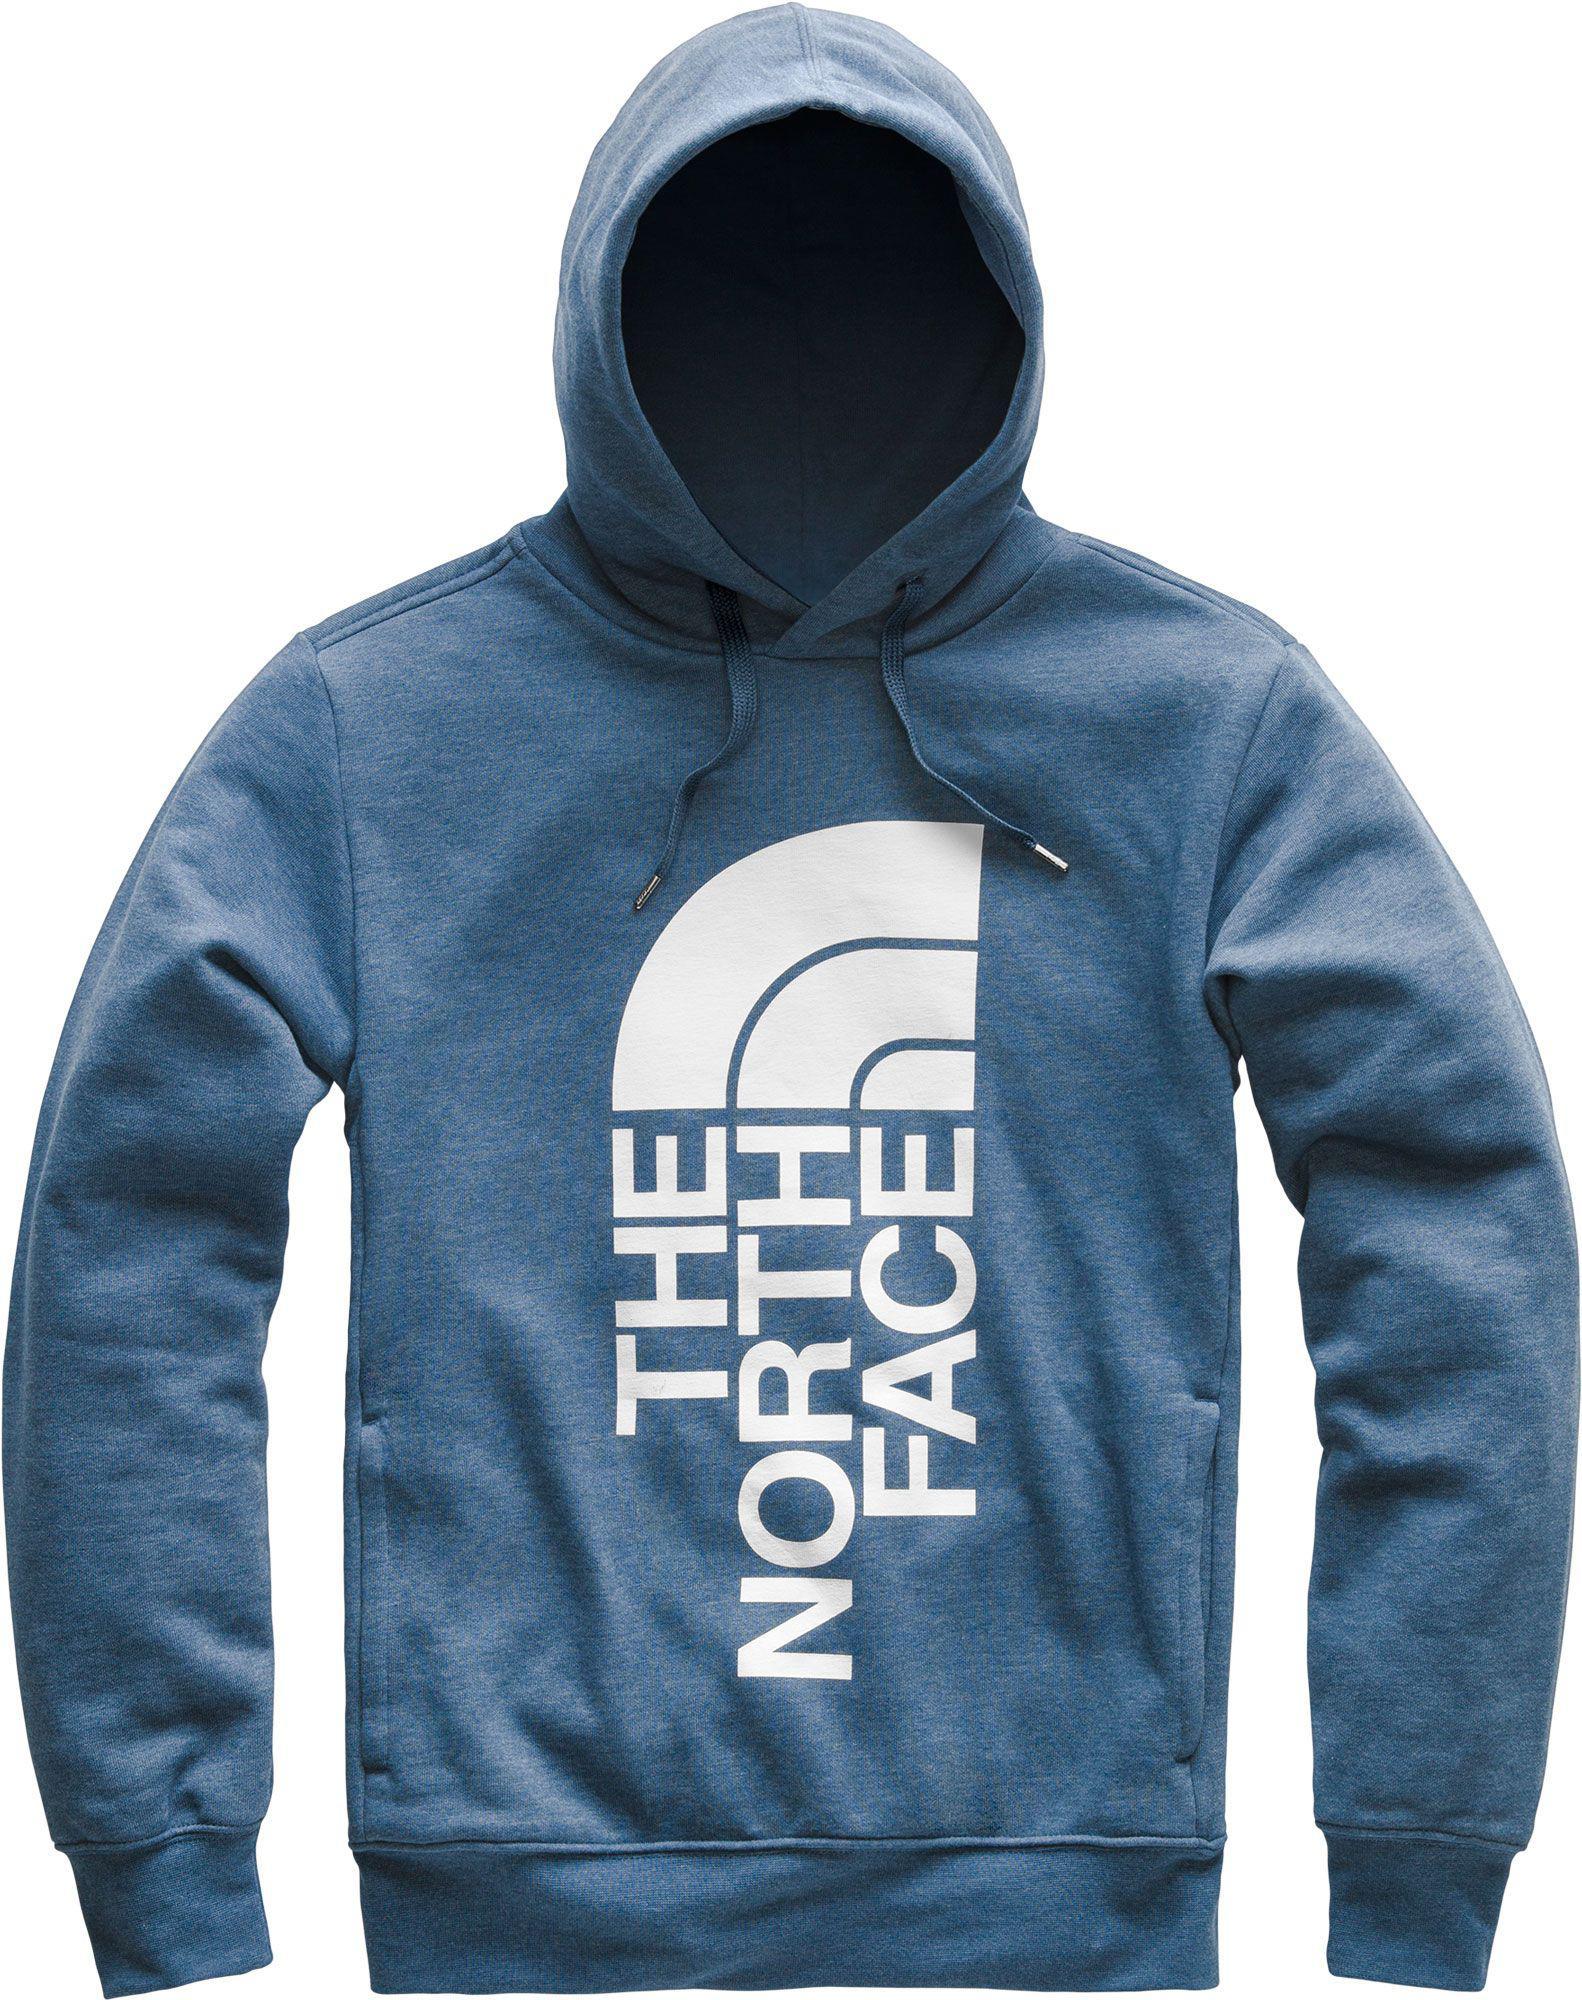 c37d704c4 closeout blue north face hoodie 5ae5f b23db